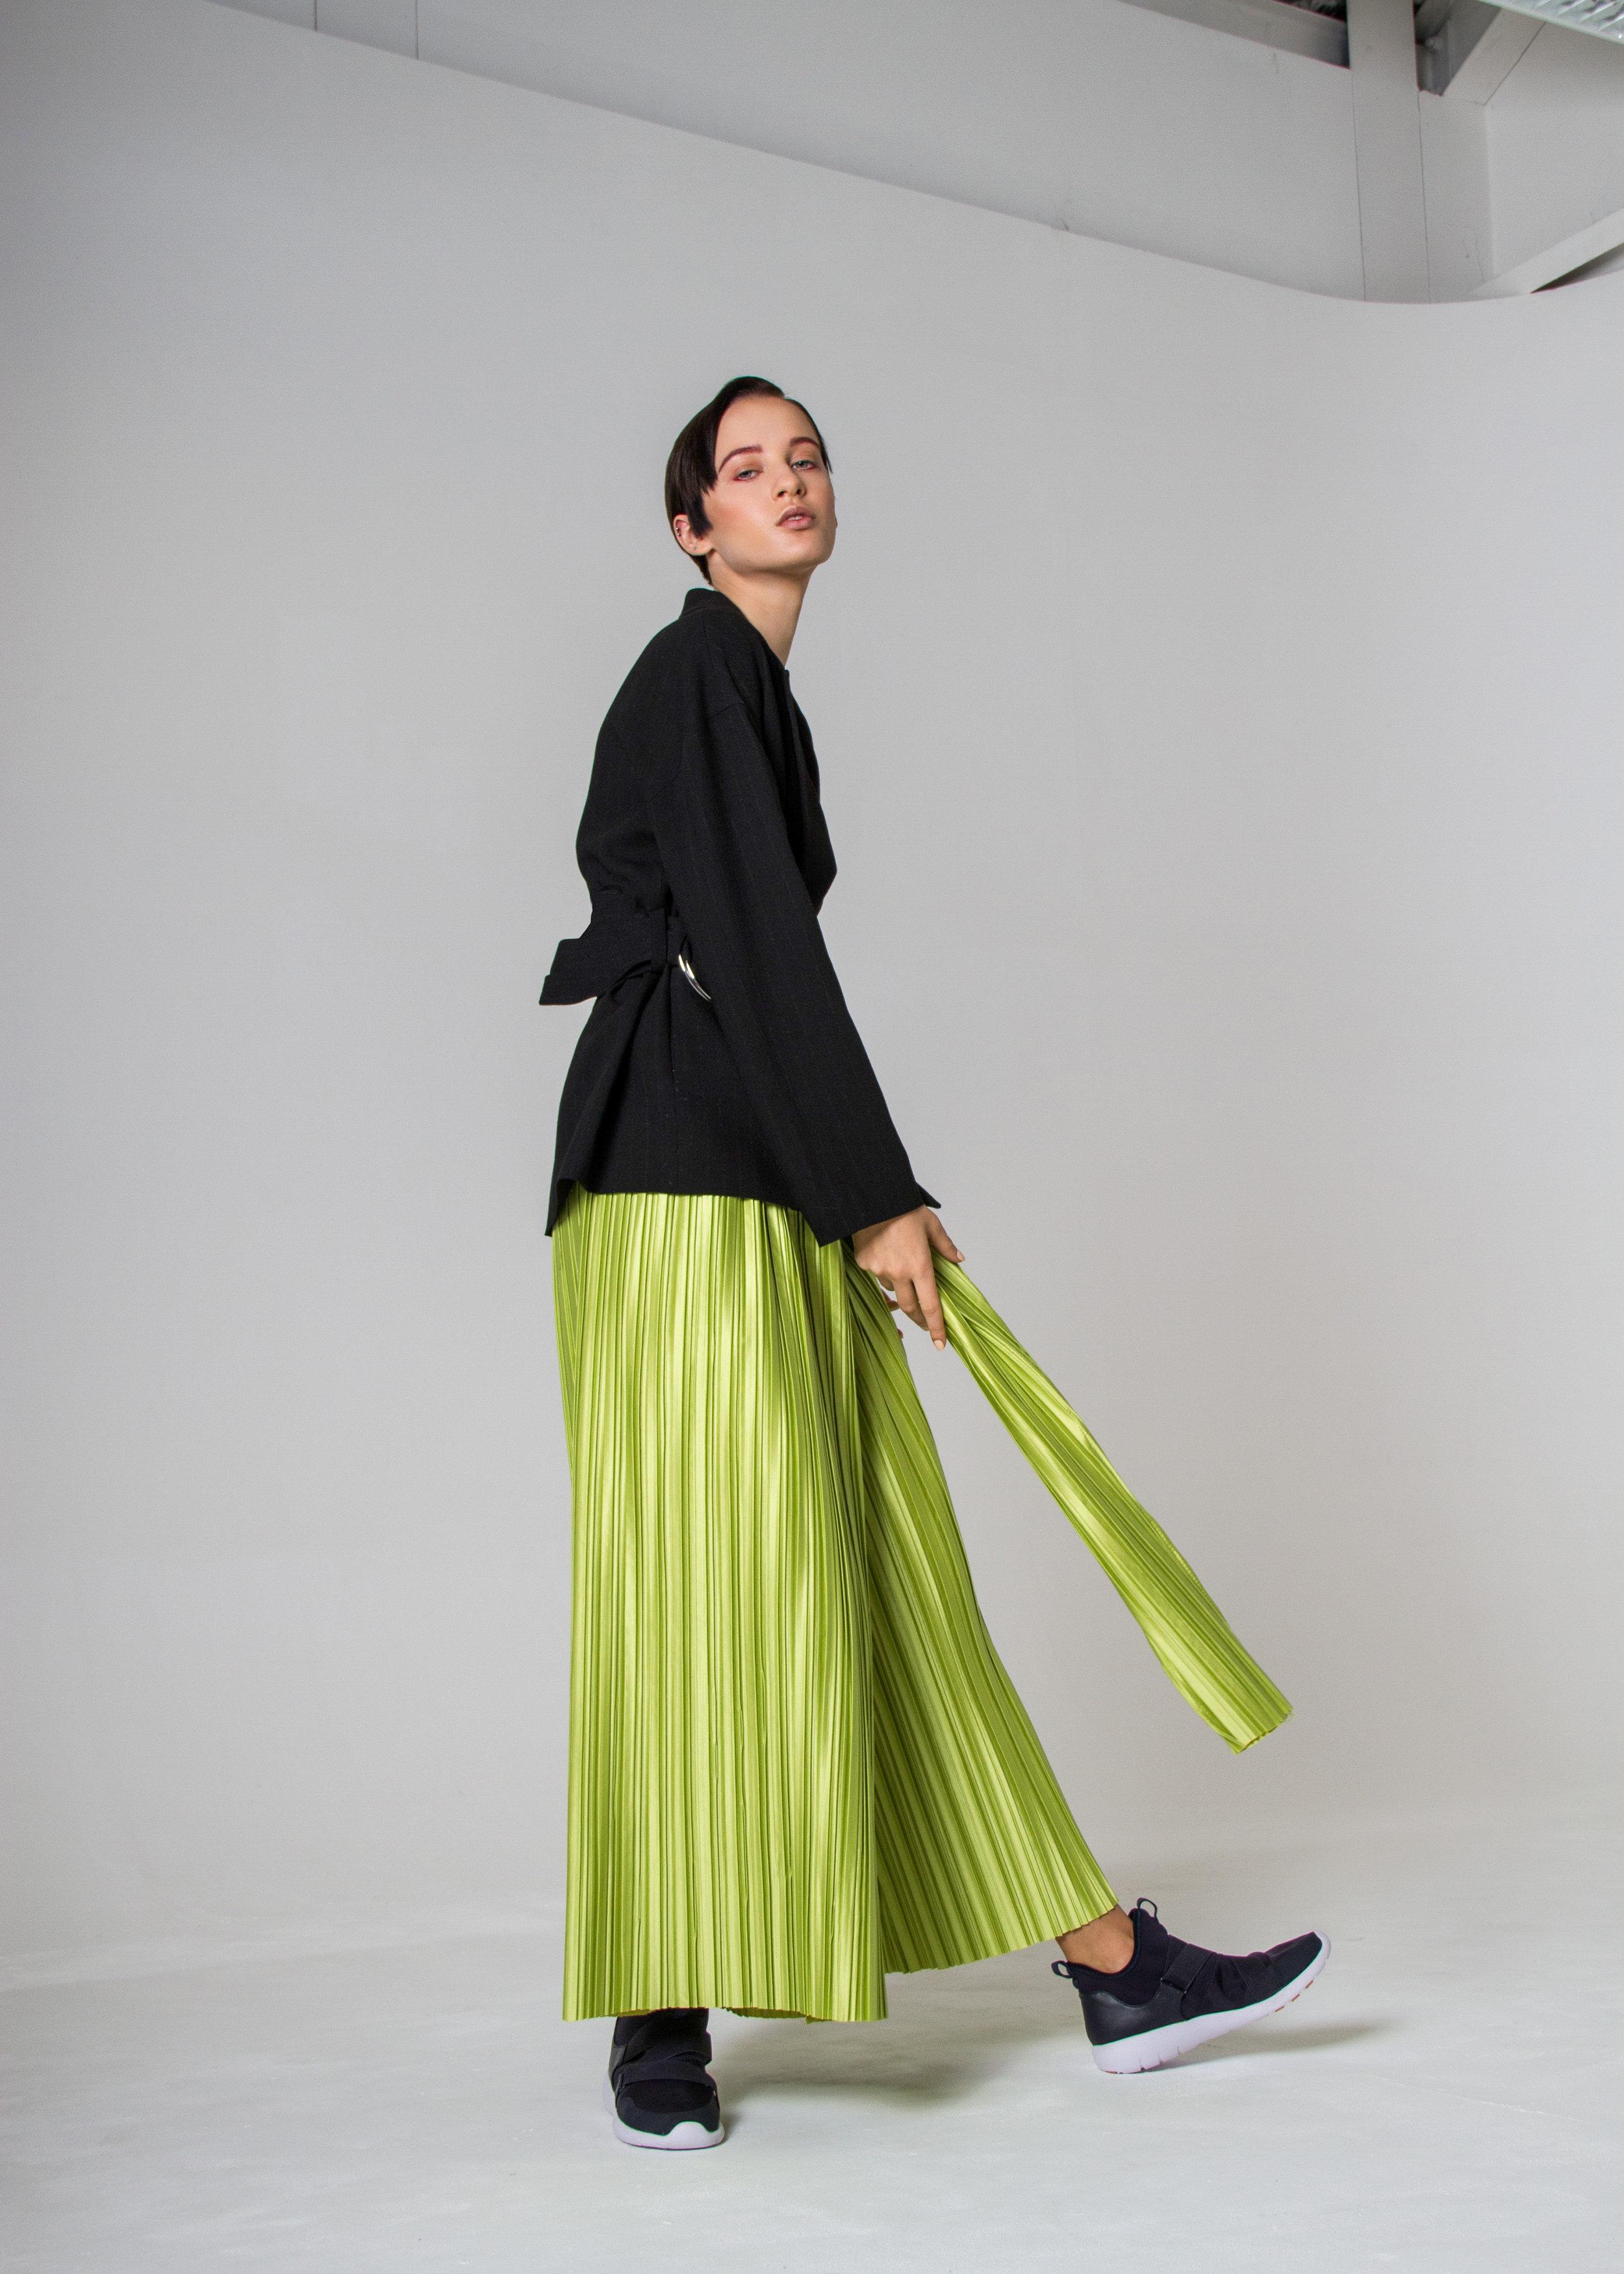 trousers  MAGDALENA CZARNIECKA , blazer ZARA, shoes H&M